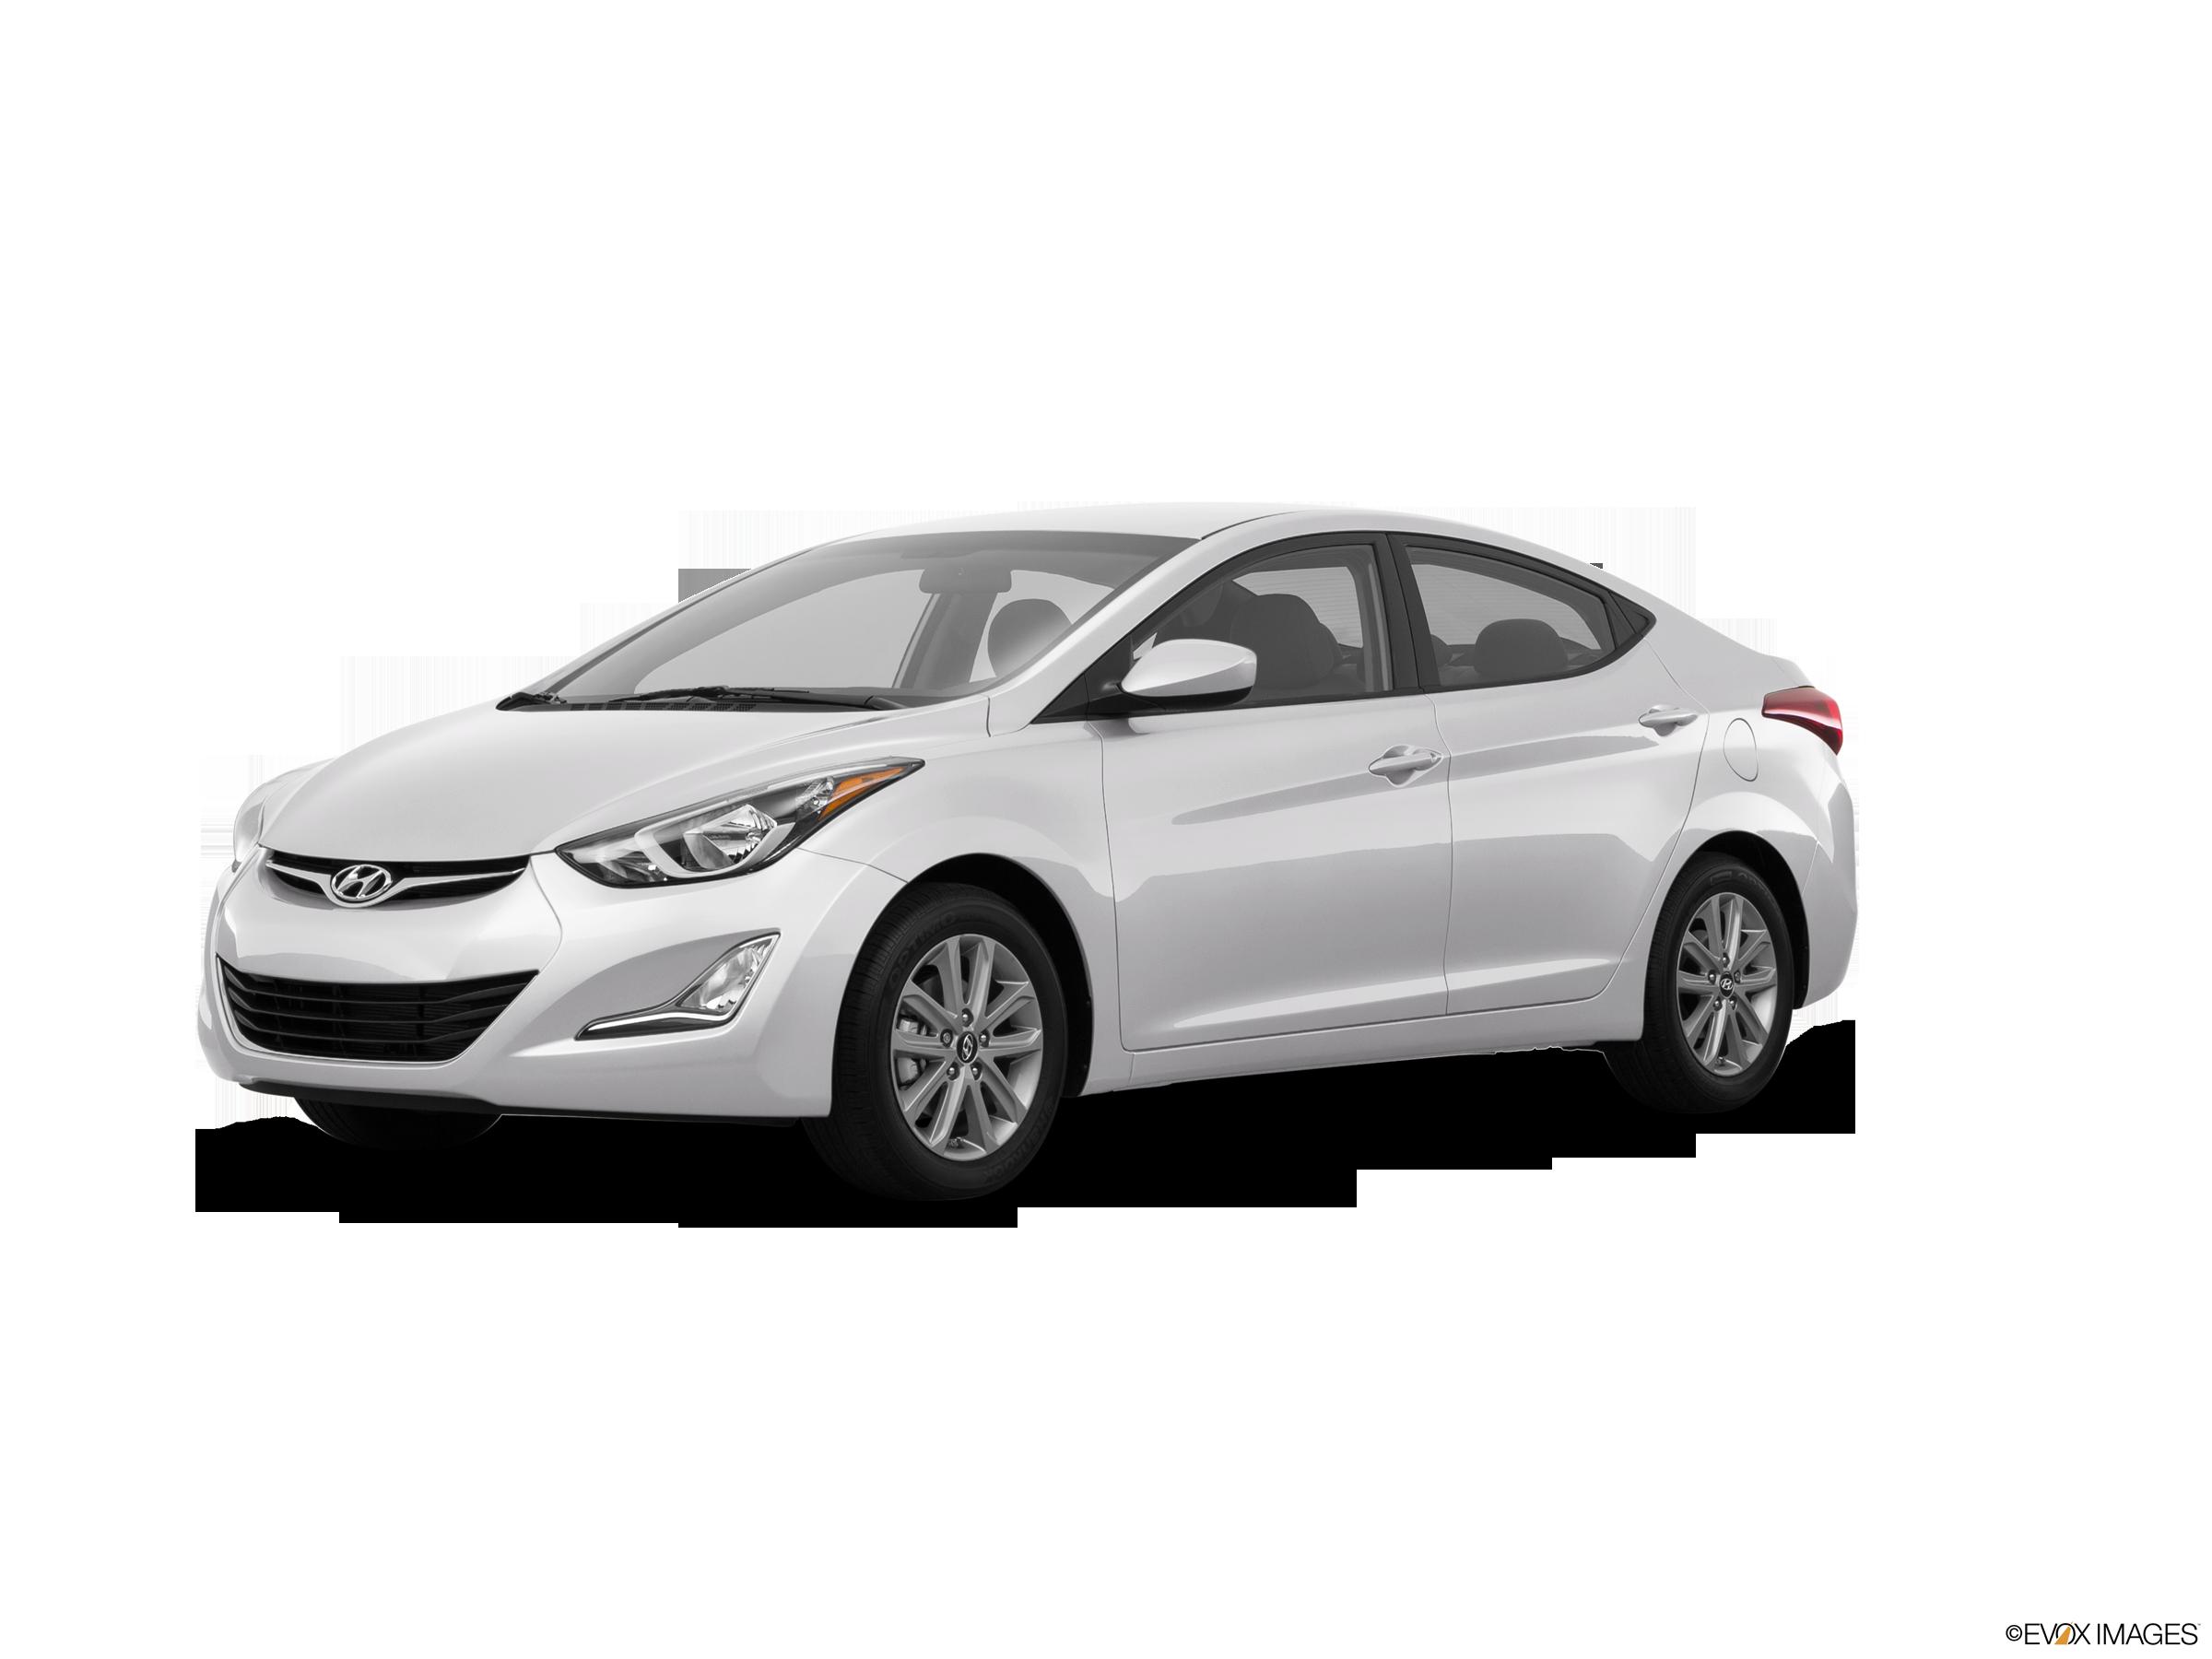 2016 hyundai elantra values cars for sale kelley blue book 2016 hyundai elantra values cars for